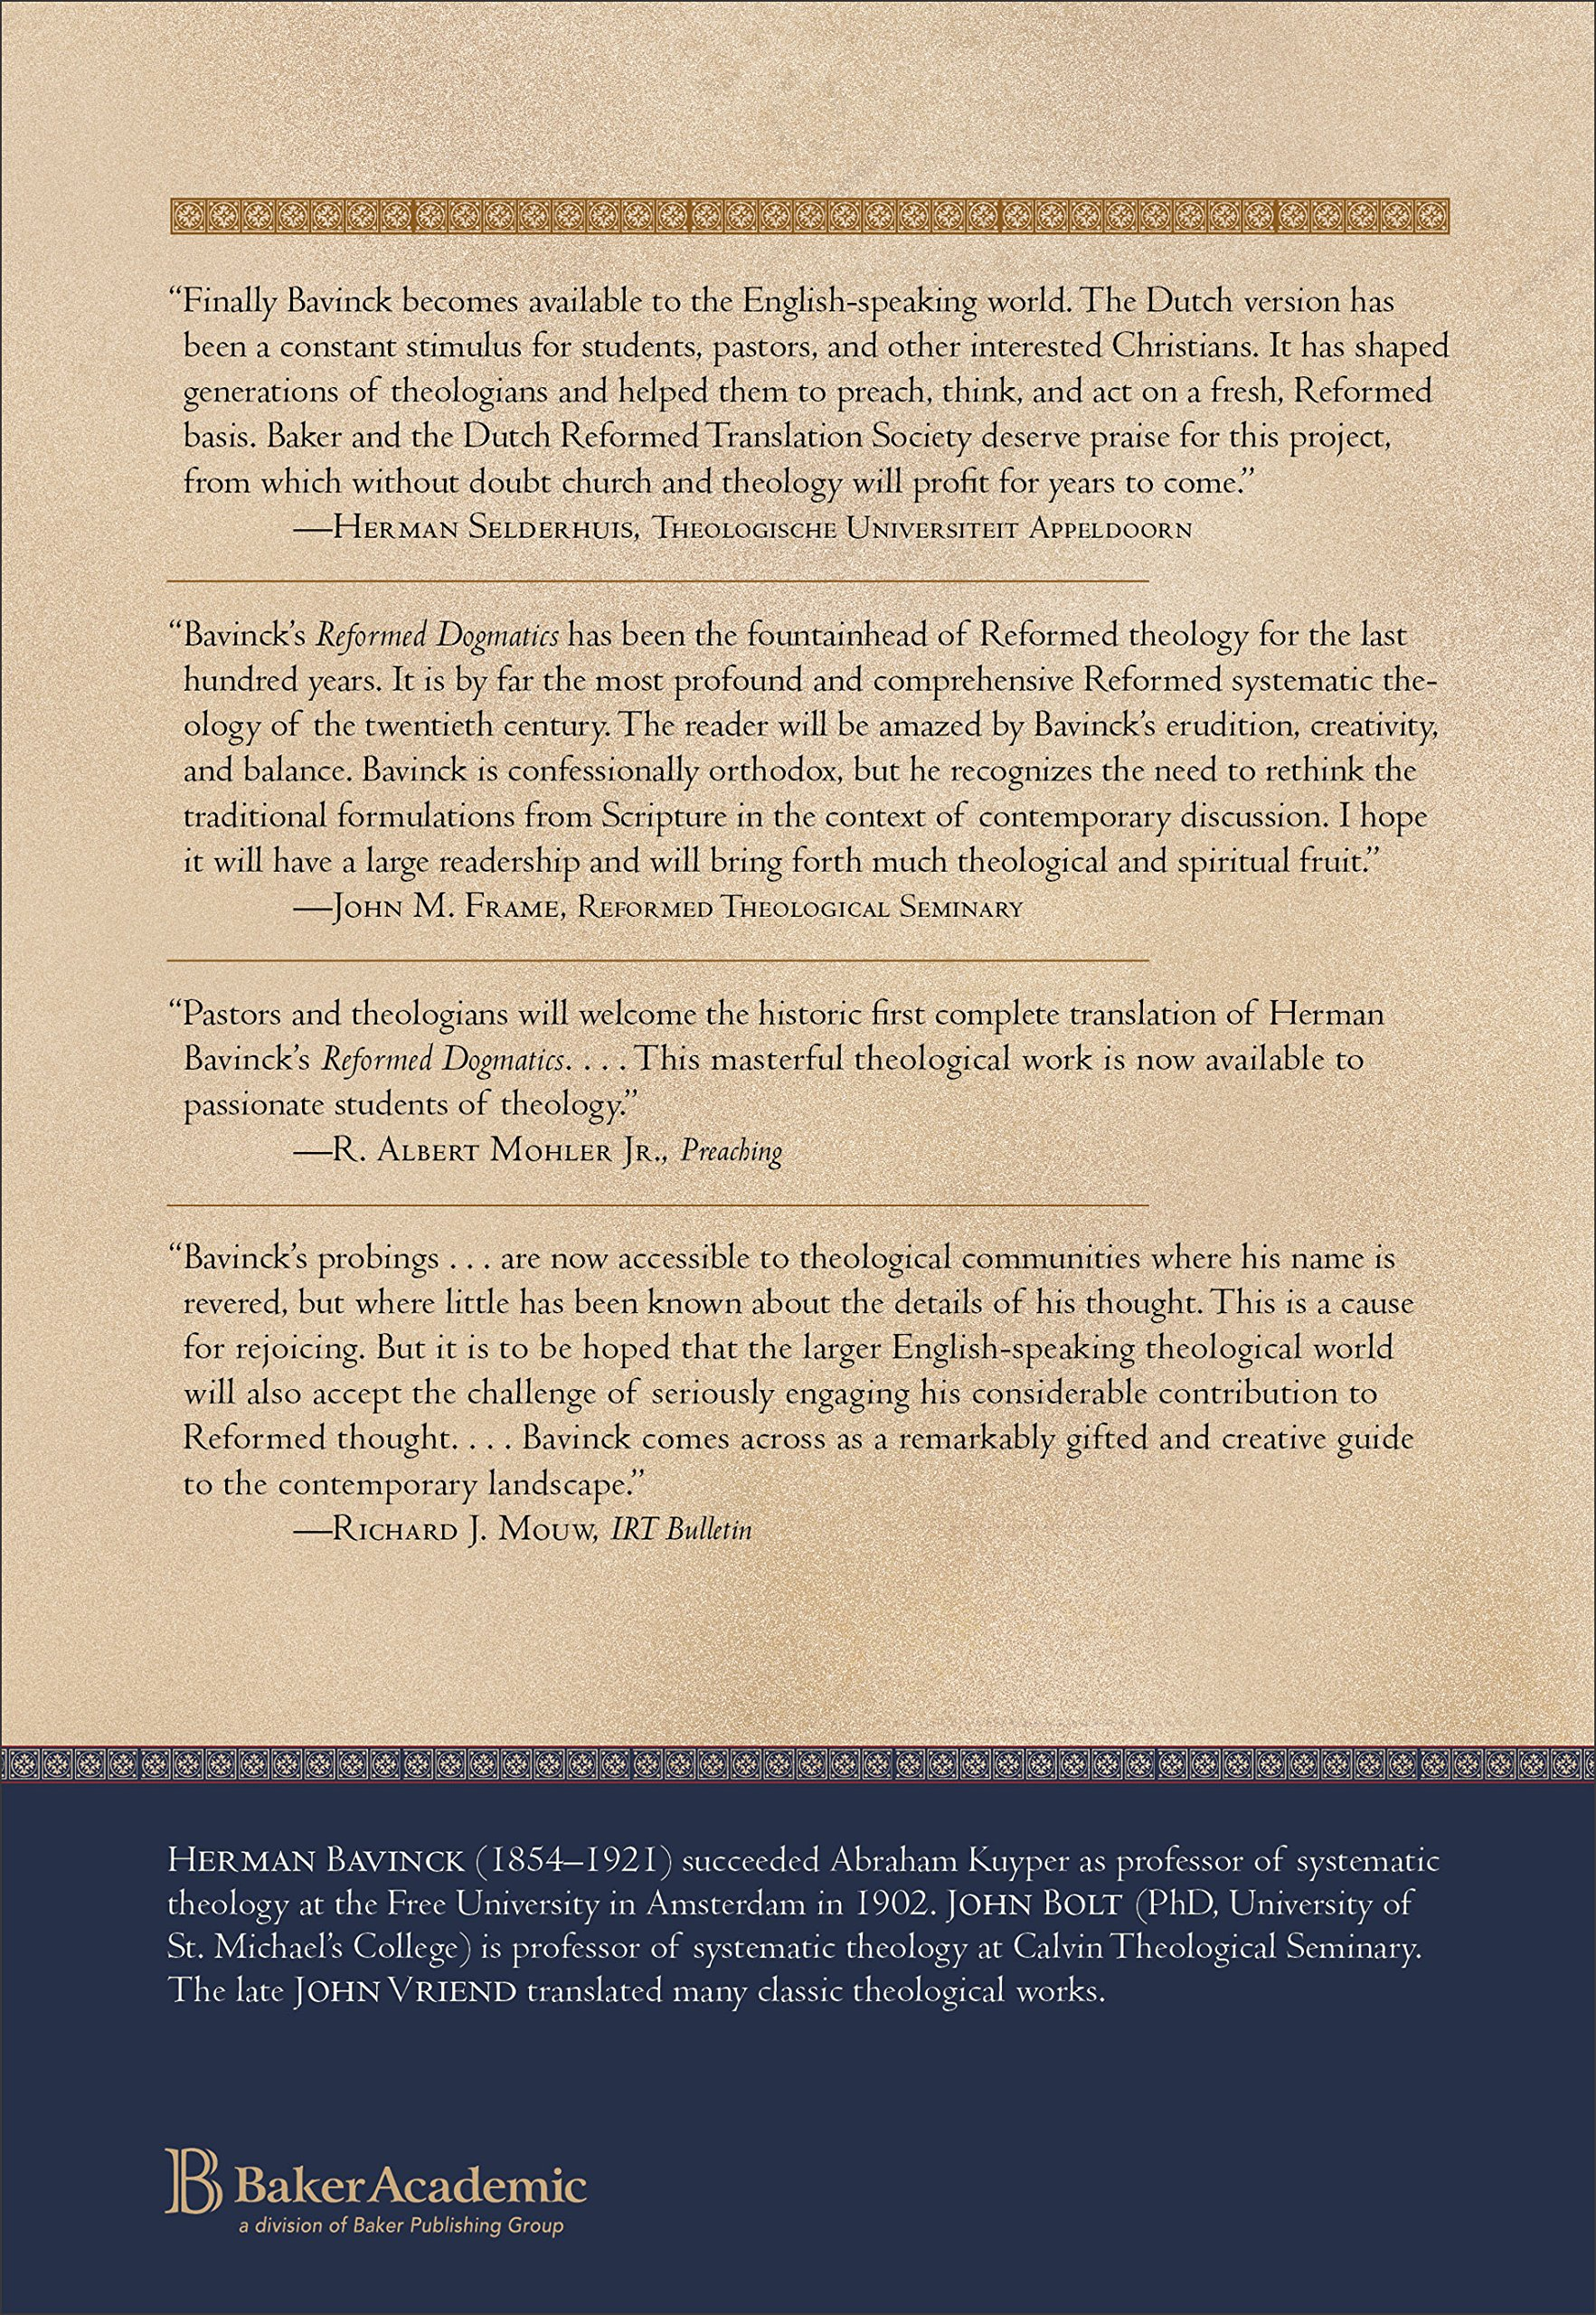 Reformed dogmatics vol 1 prolegomena herman bavinck john bolt reformed dogmatics vol 1 prolegomena herman bavinck john bolt john vriend 9780801026324 amazon books fandeluxe Choice Image